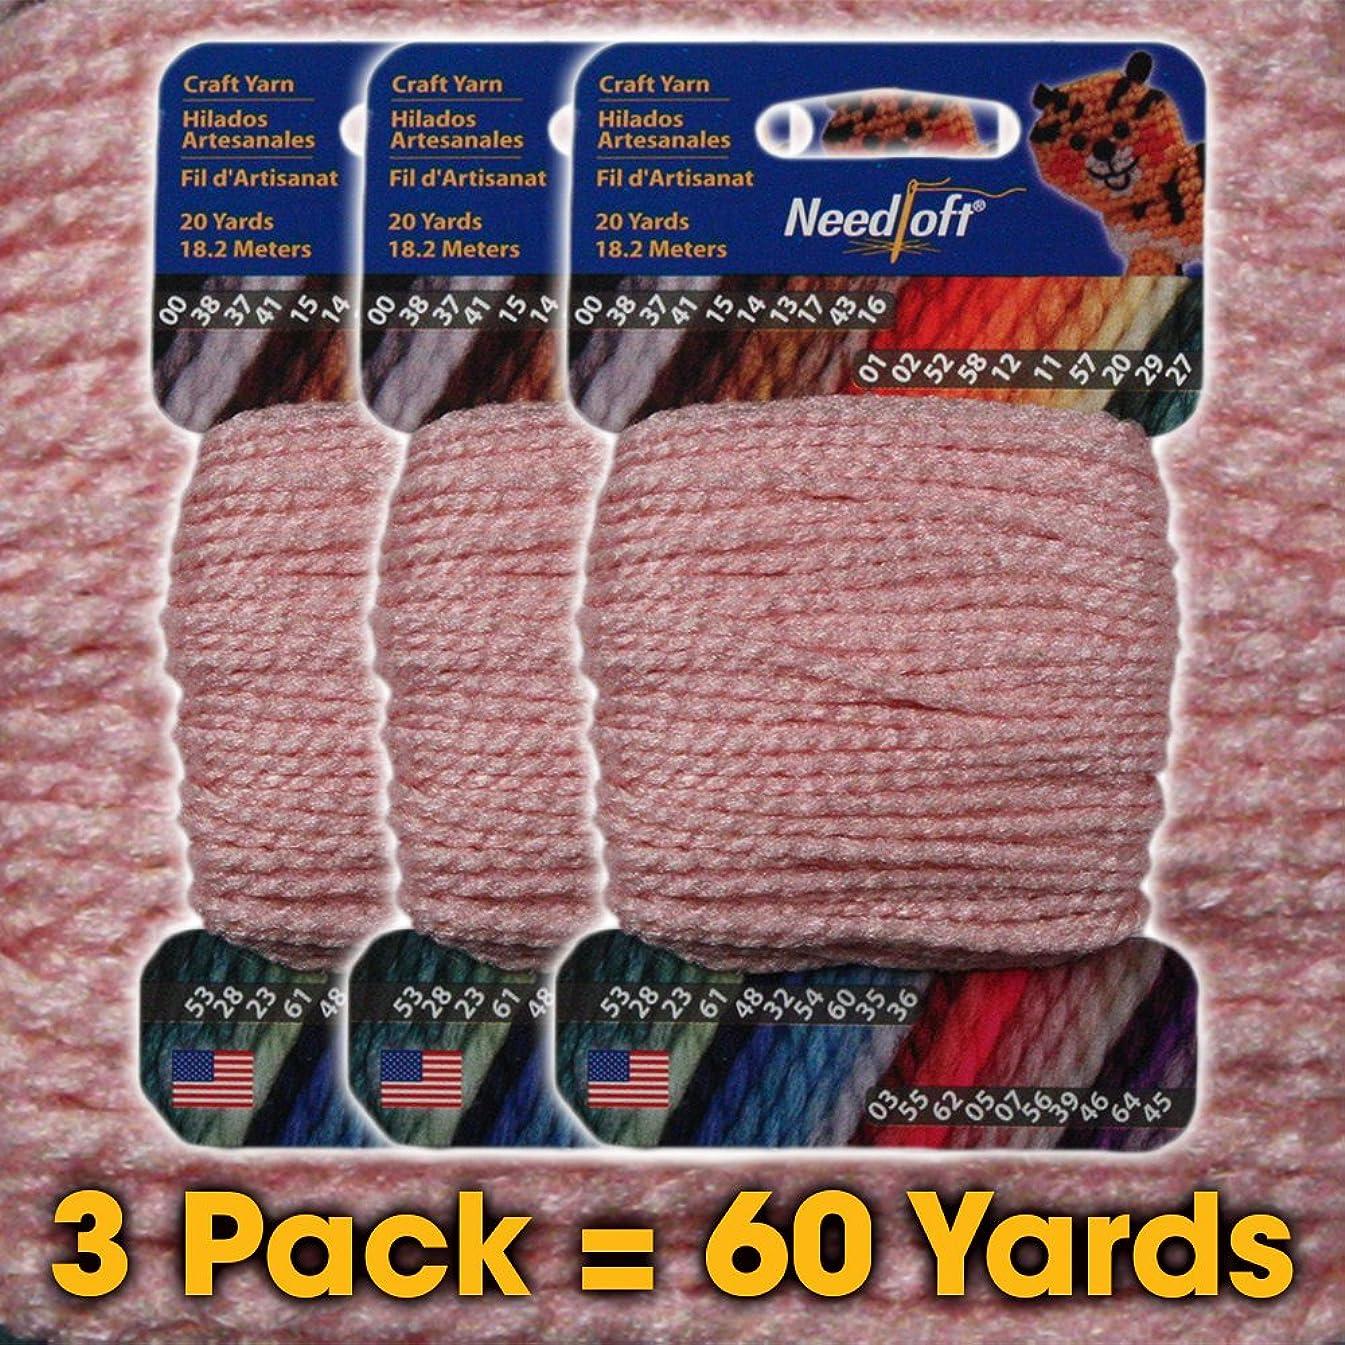 #07 Pink - Needloft Craft Yarn 3 Pack 60 Yards (3x20yds)